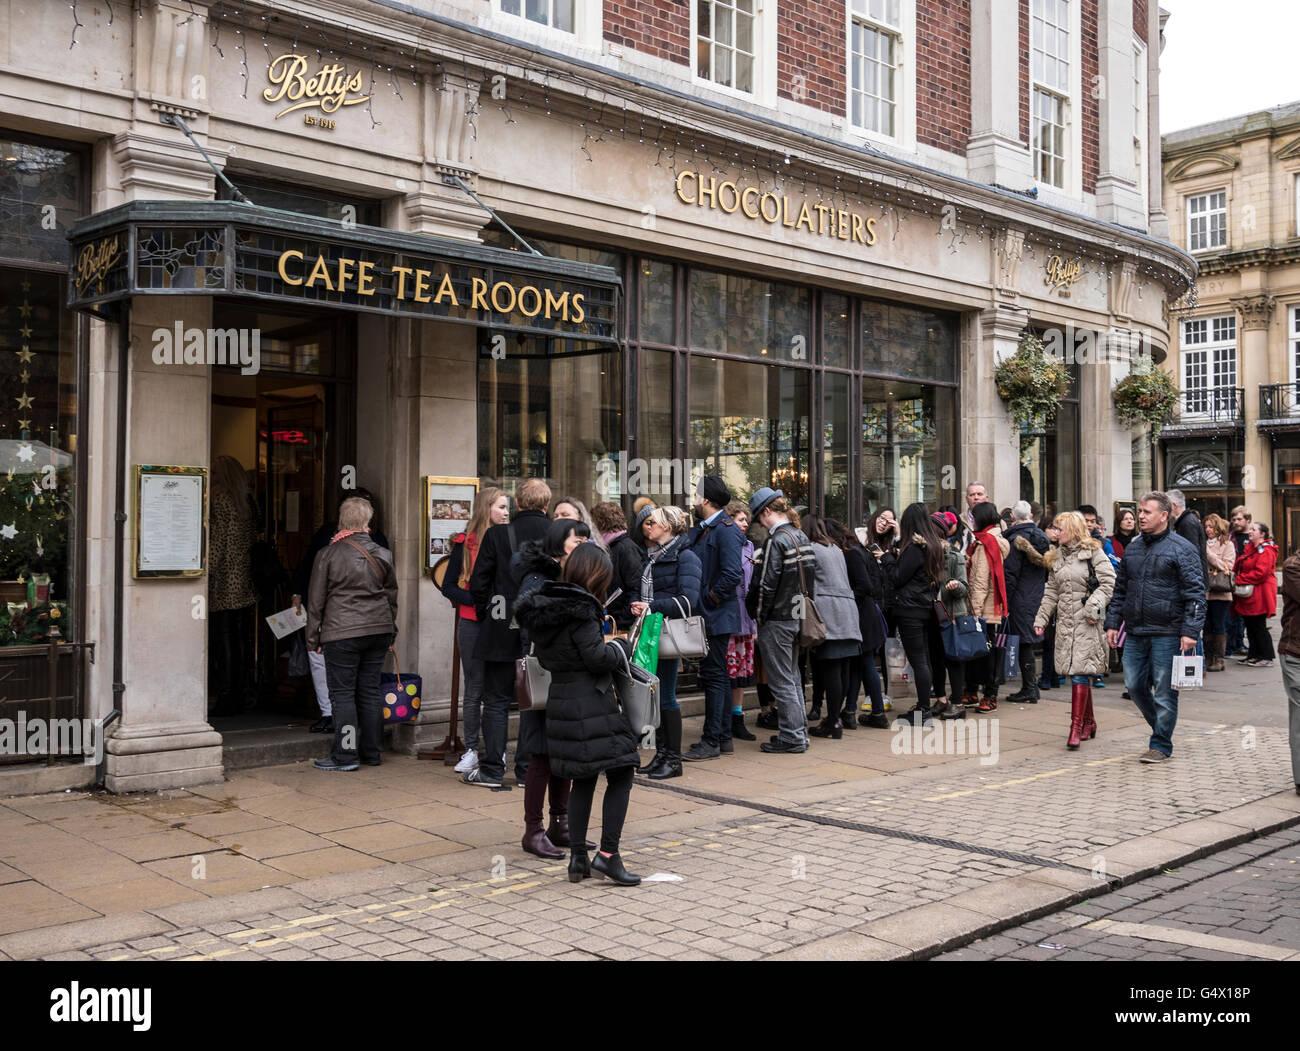 Queue at Bettys Cafe Tearoom York UK - Stock Image